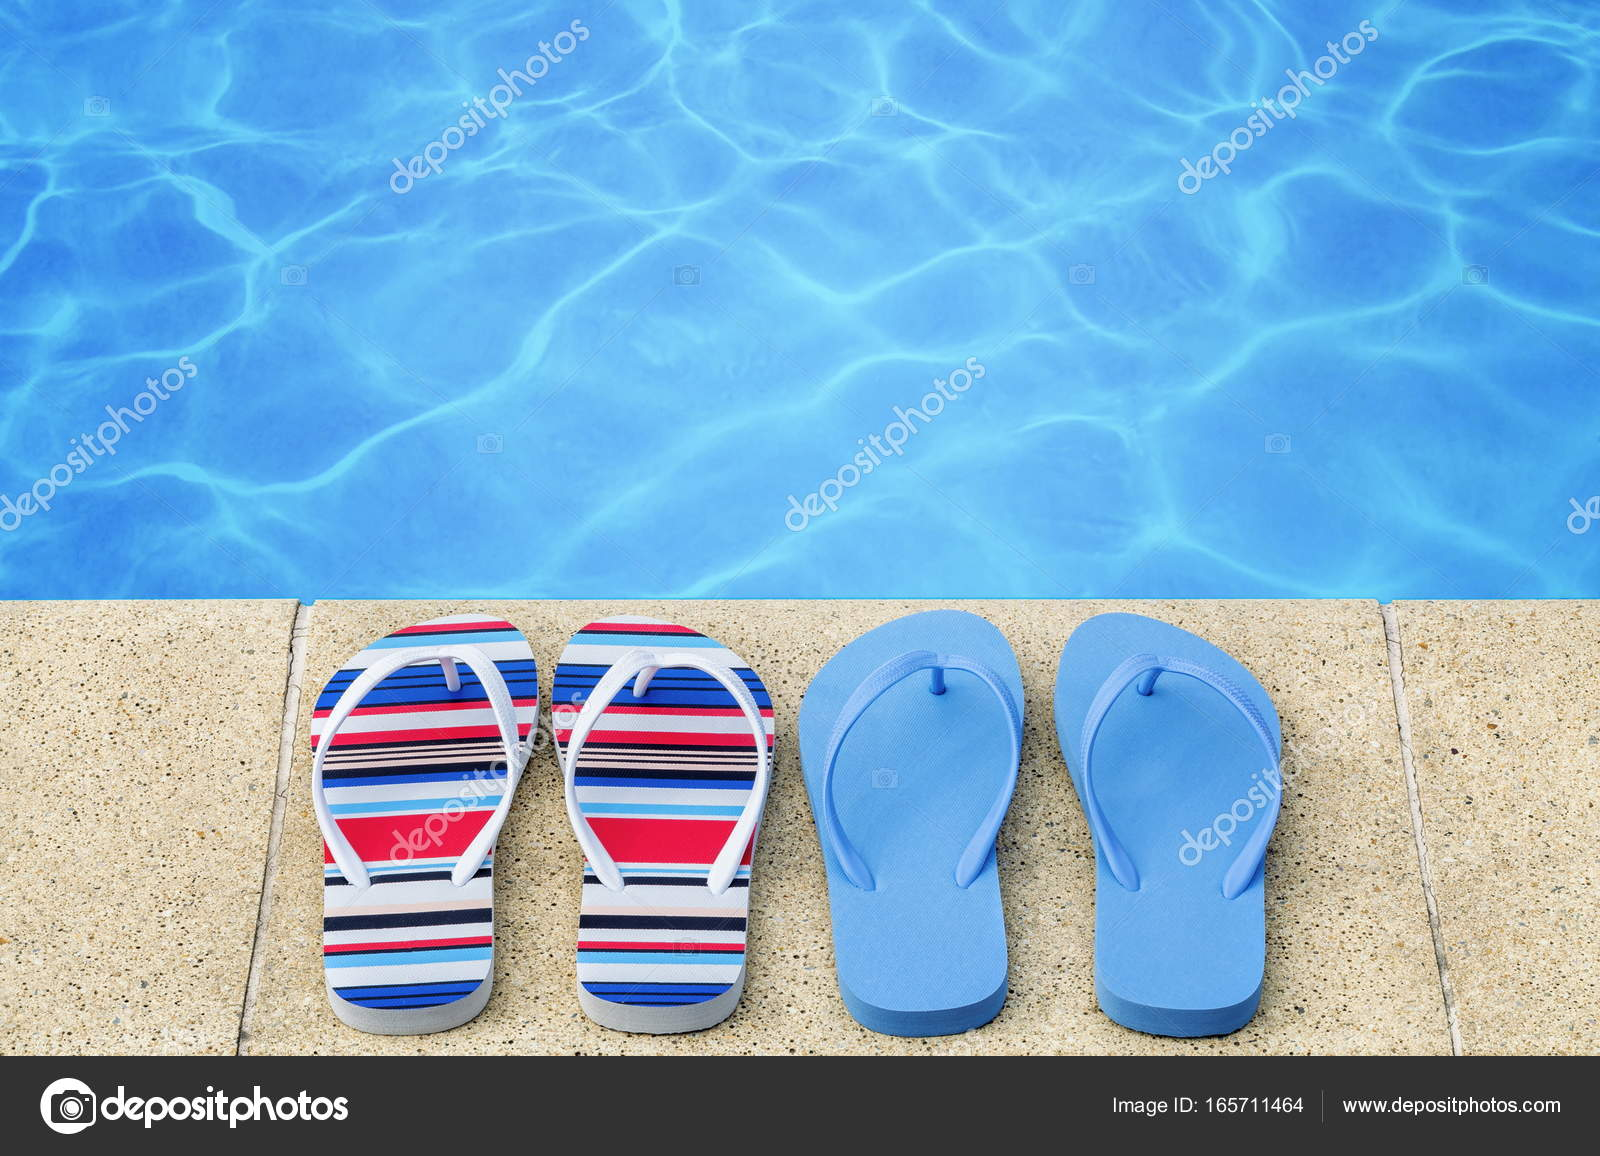 7780793c6f9125 Flip flops near swimming pool — Stock Photo © ilze79 #165711464